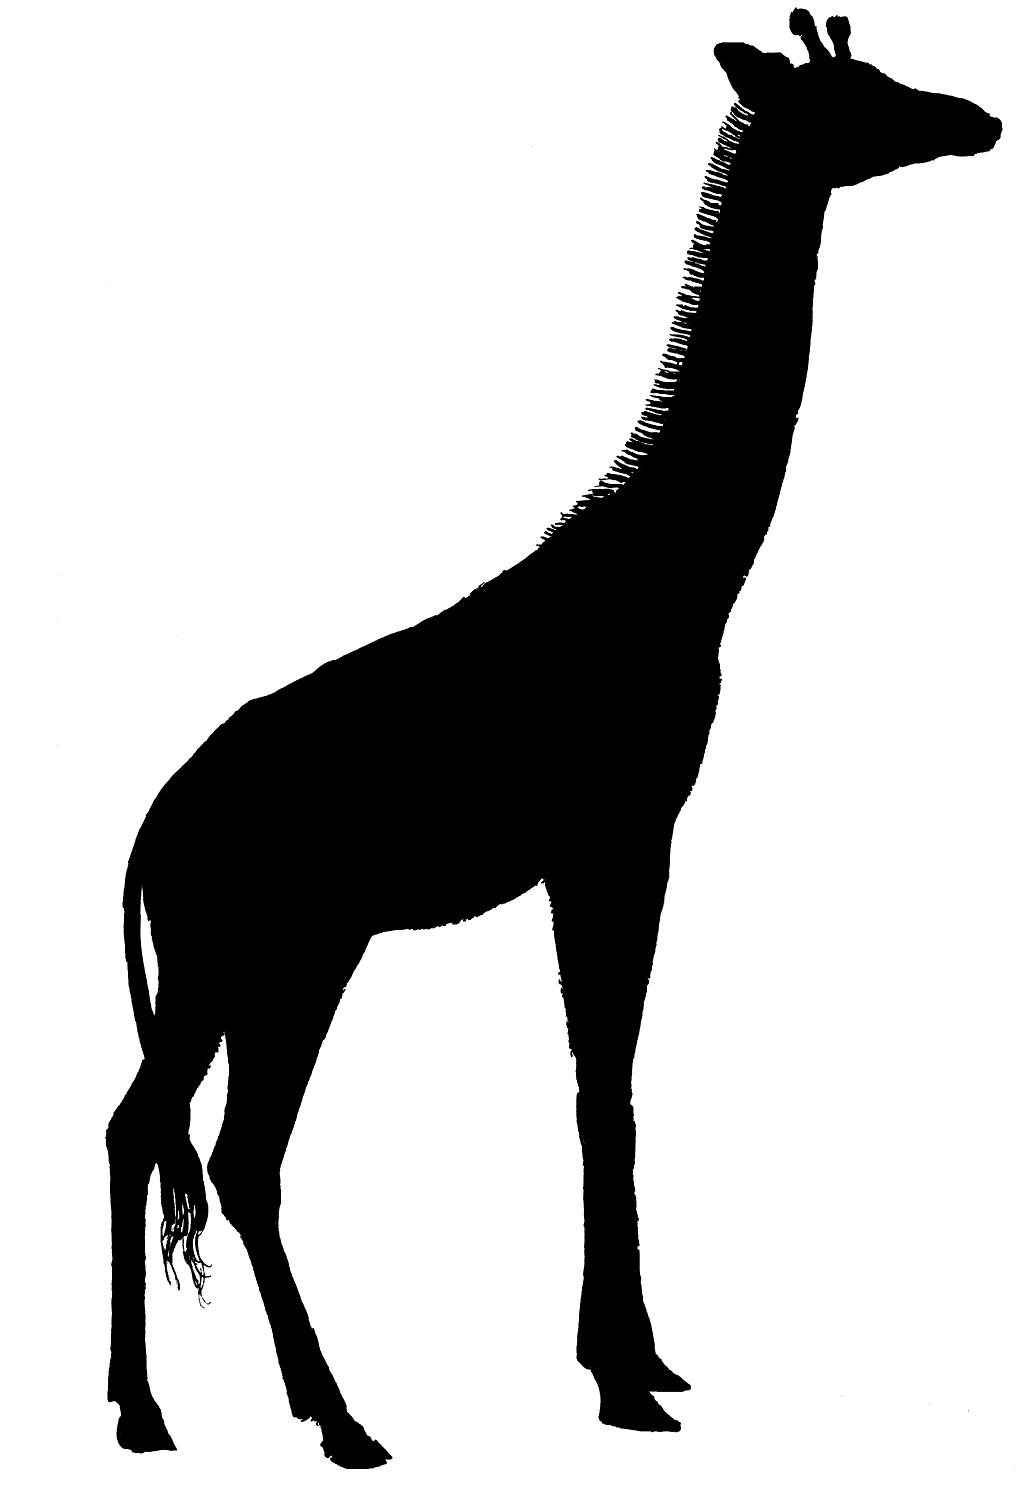 1022x1492 Giraffe Silhouette Clip Art